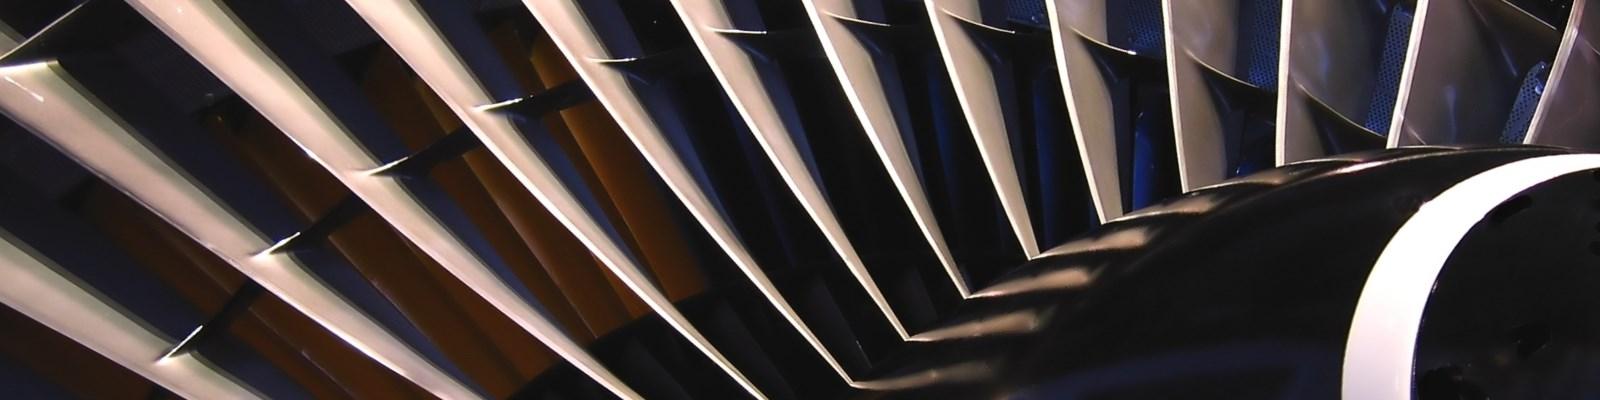 Nuovo Pignone GE turbines spare parts